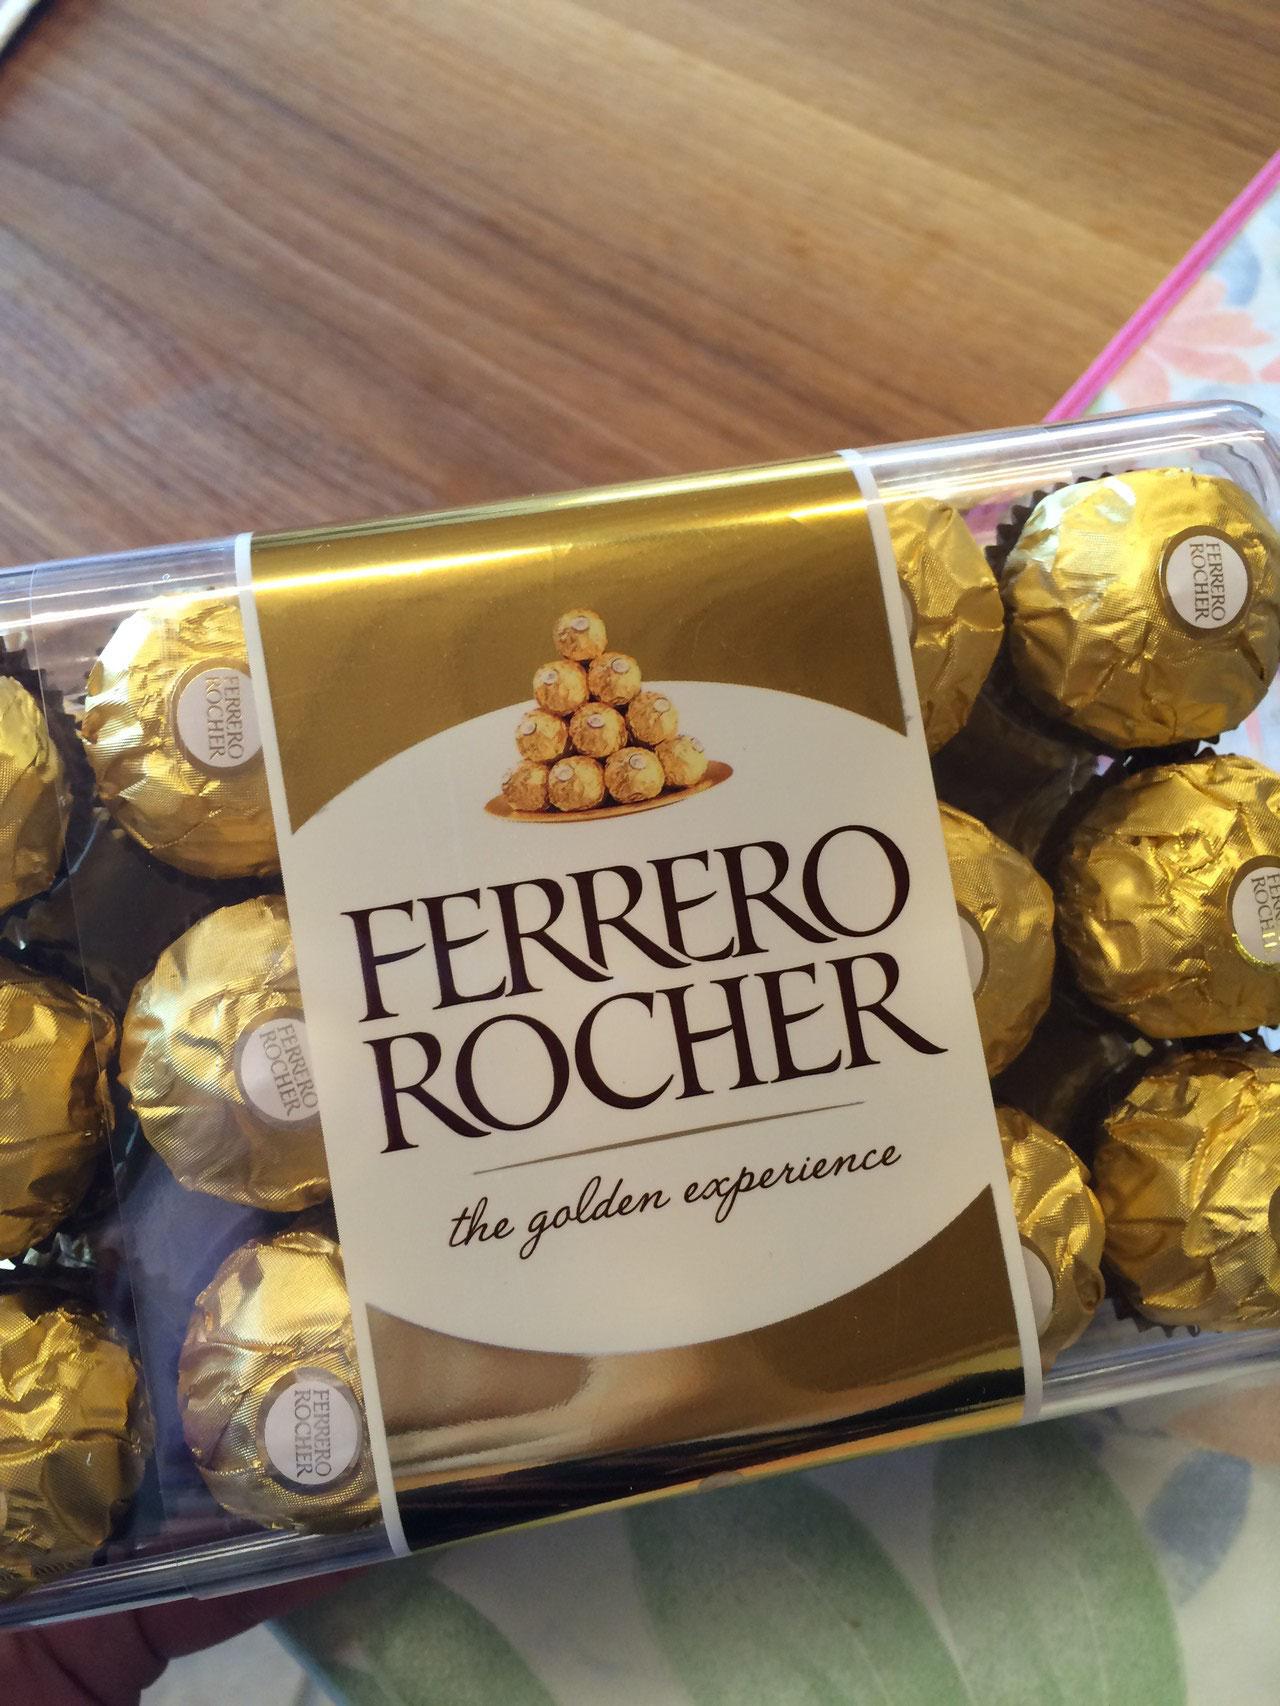 Ferrero Rocher...